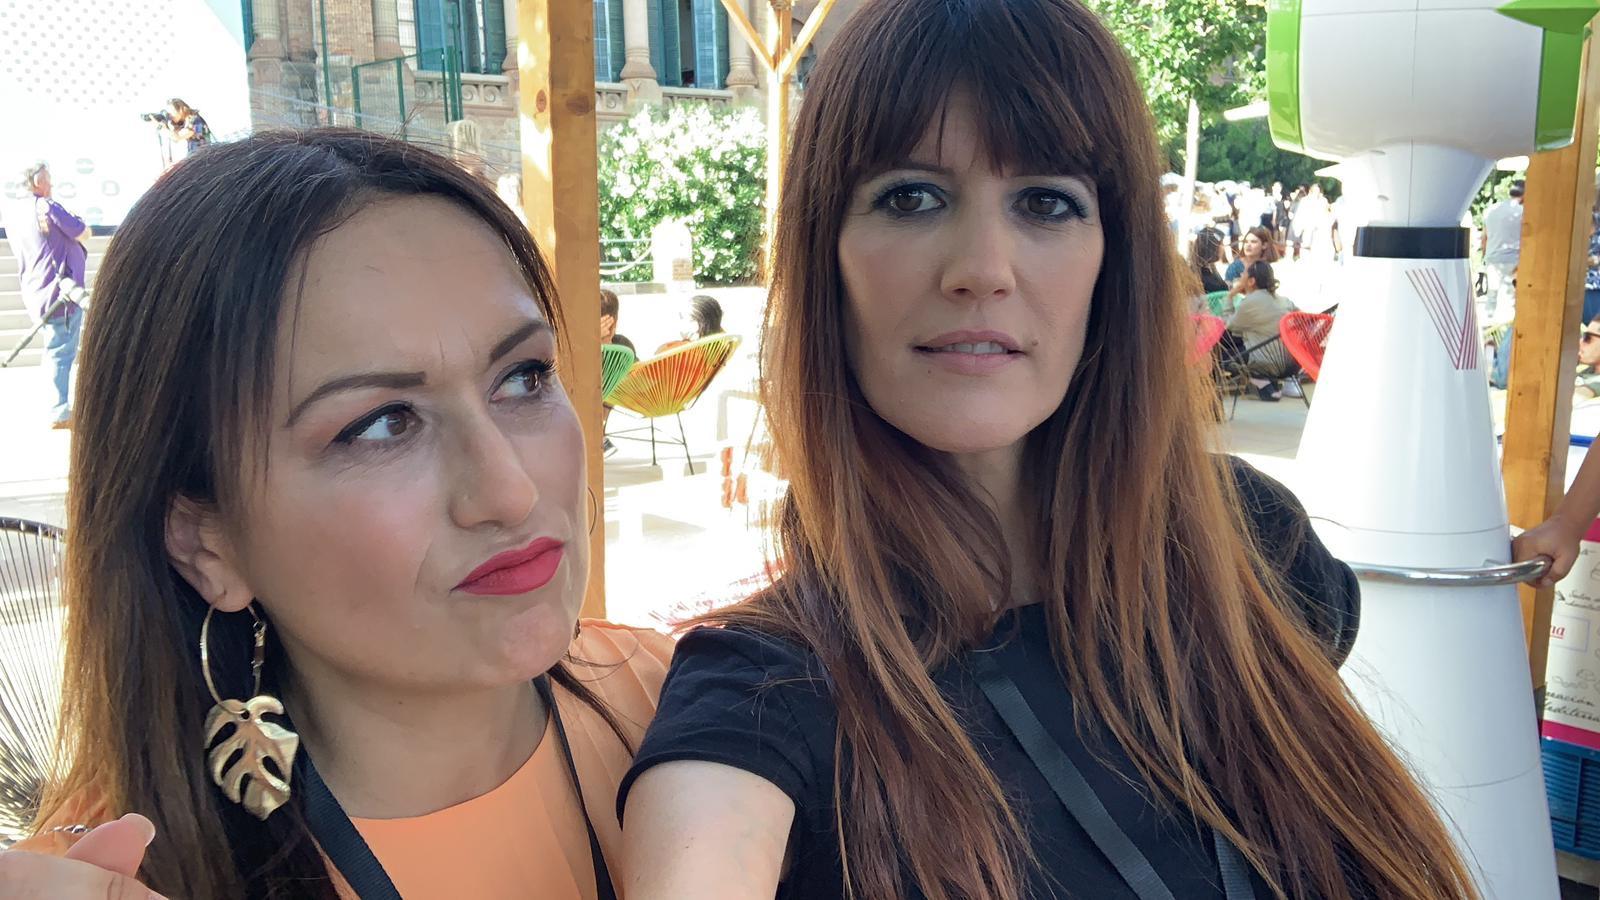 Whynot-shopper-Esther-Palanca-tv-tendencias-080-bcn-fashion-2020